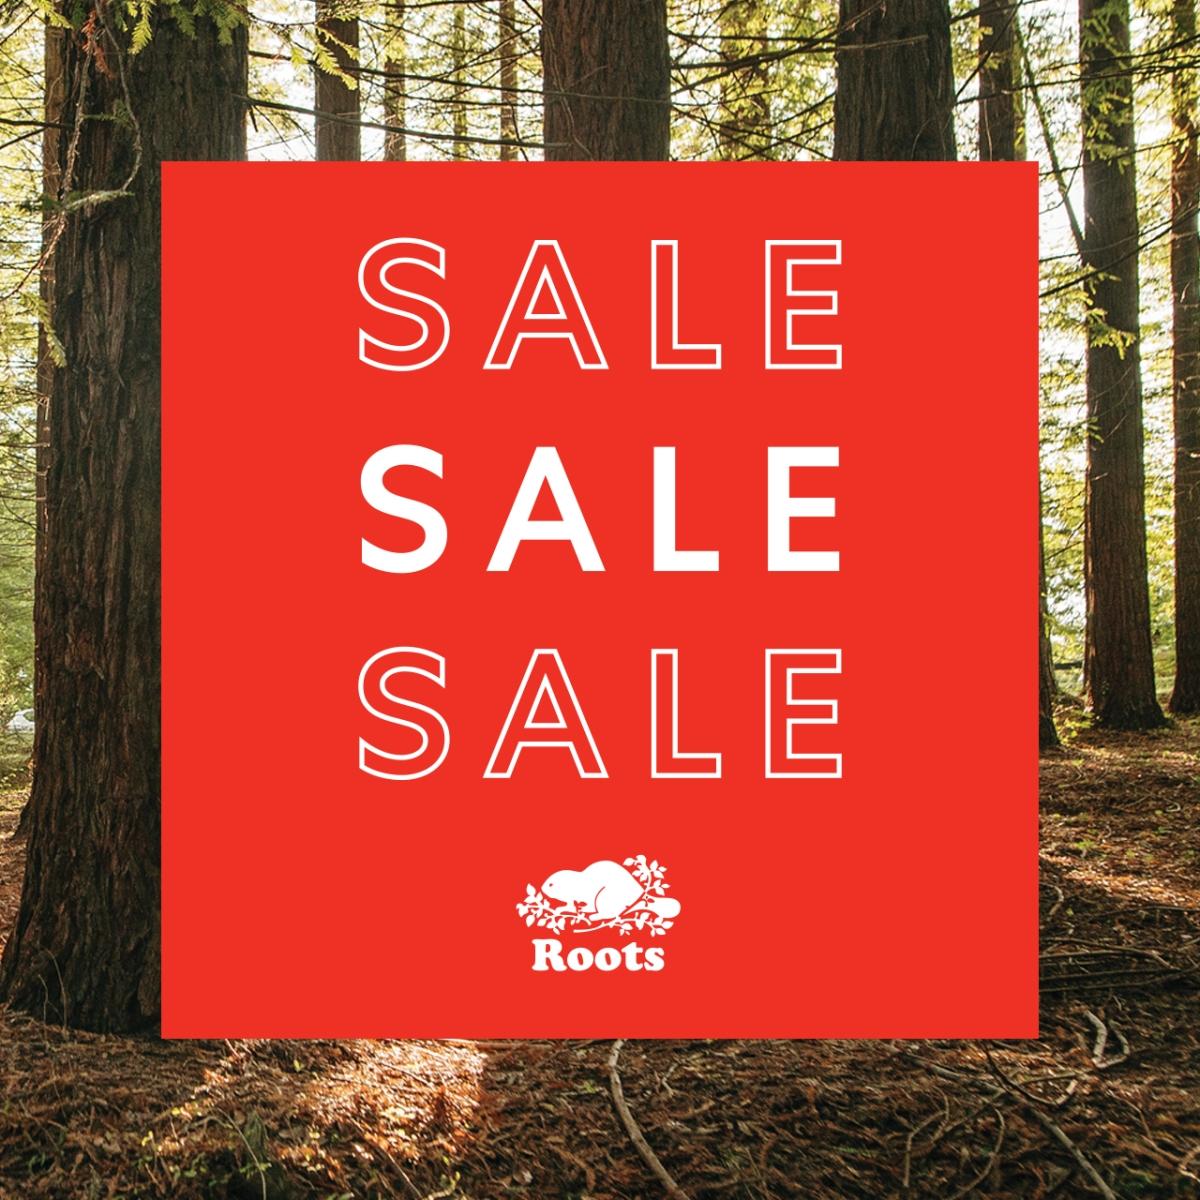 Roots sale